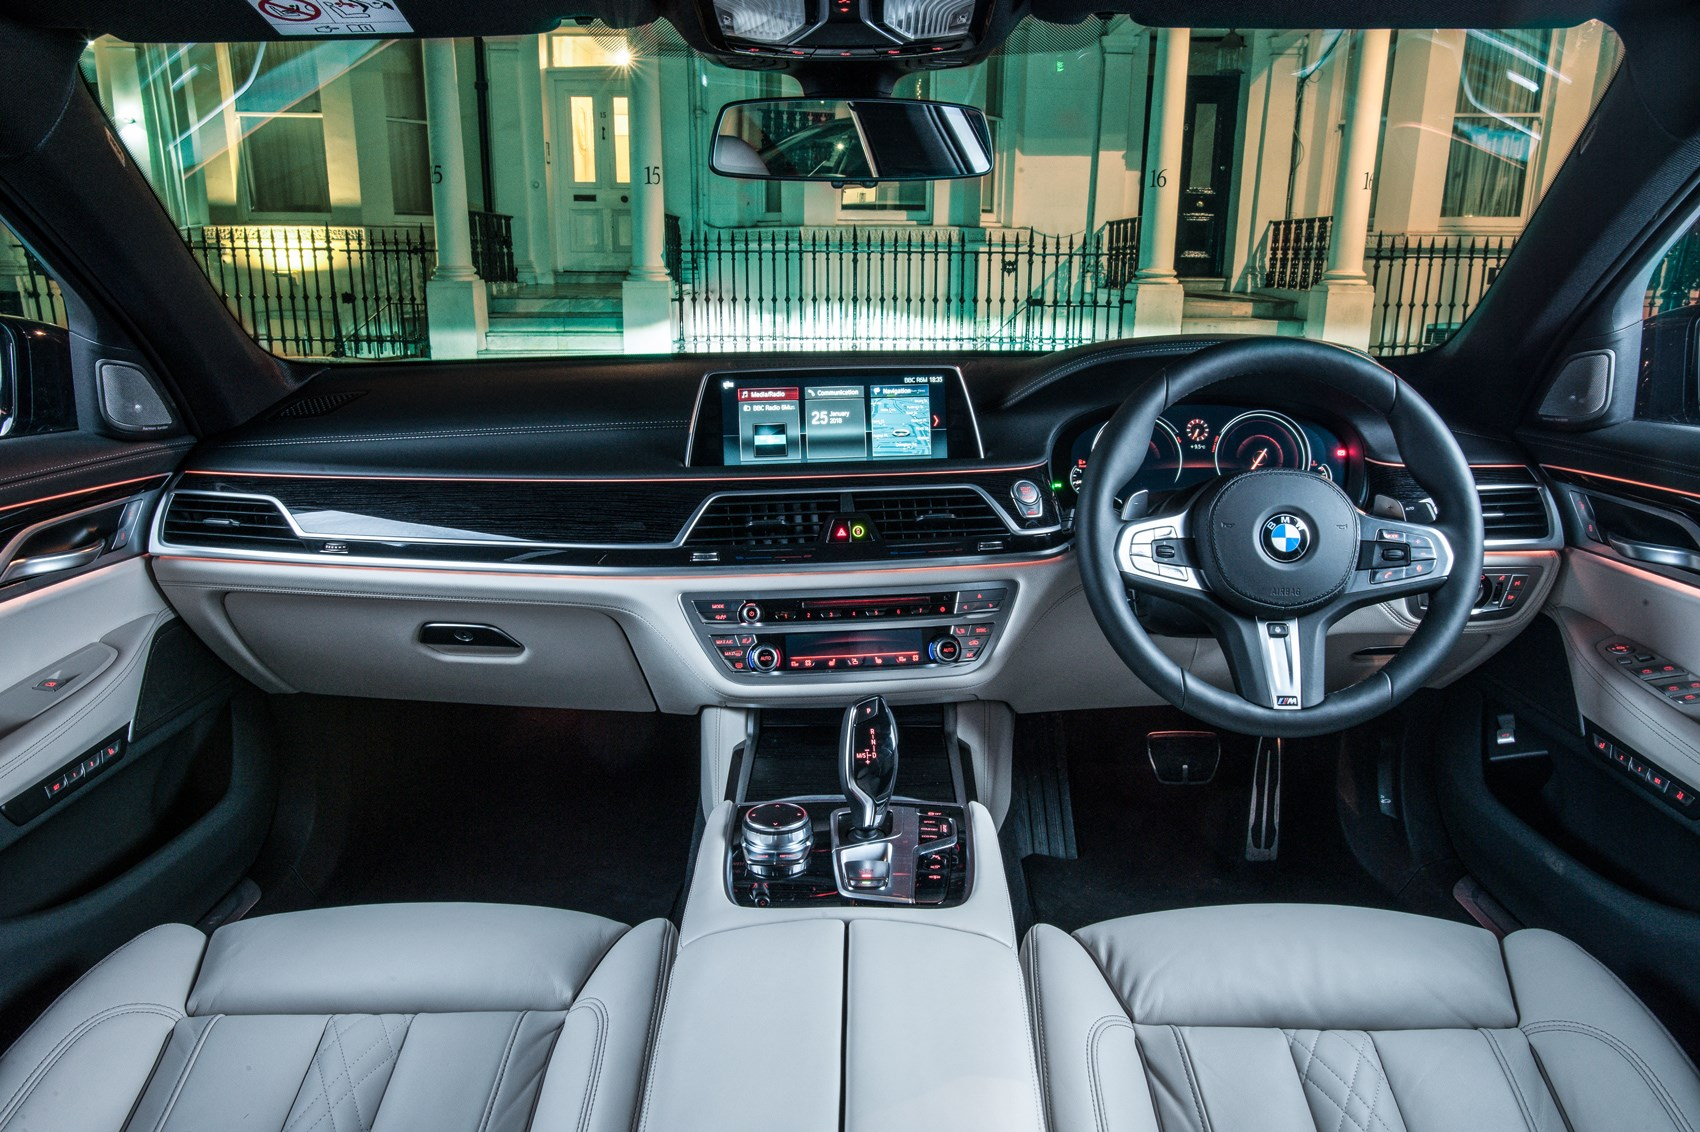 Mercedes S Class Vs Audi A8 Vs Bmw 7 Series 2018 Triple Test